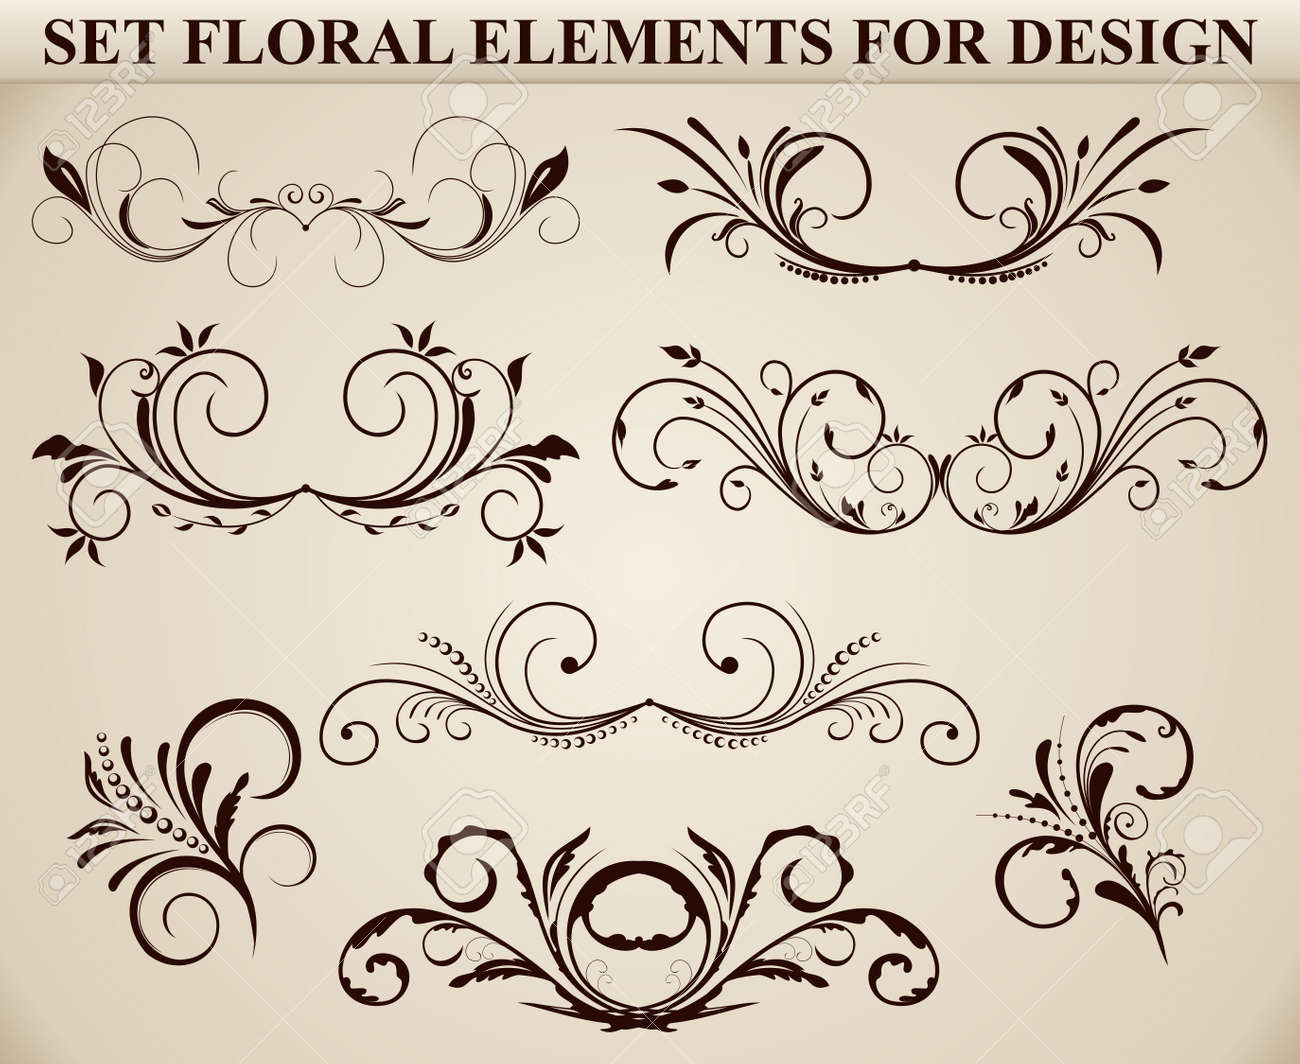 Set of ornate floral elements for design Stock Vector - 7589650